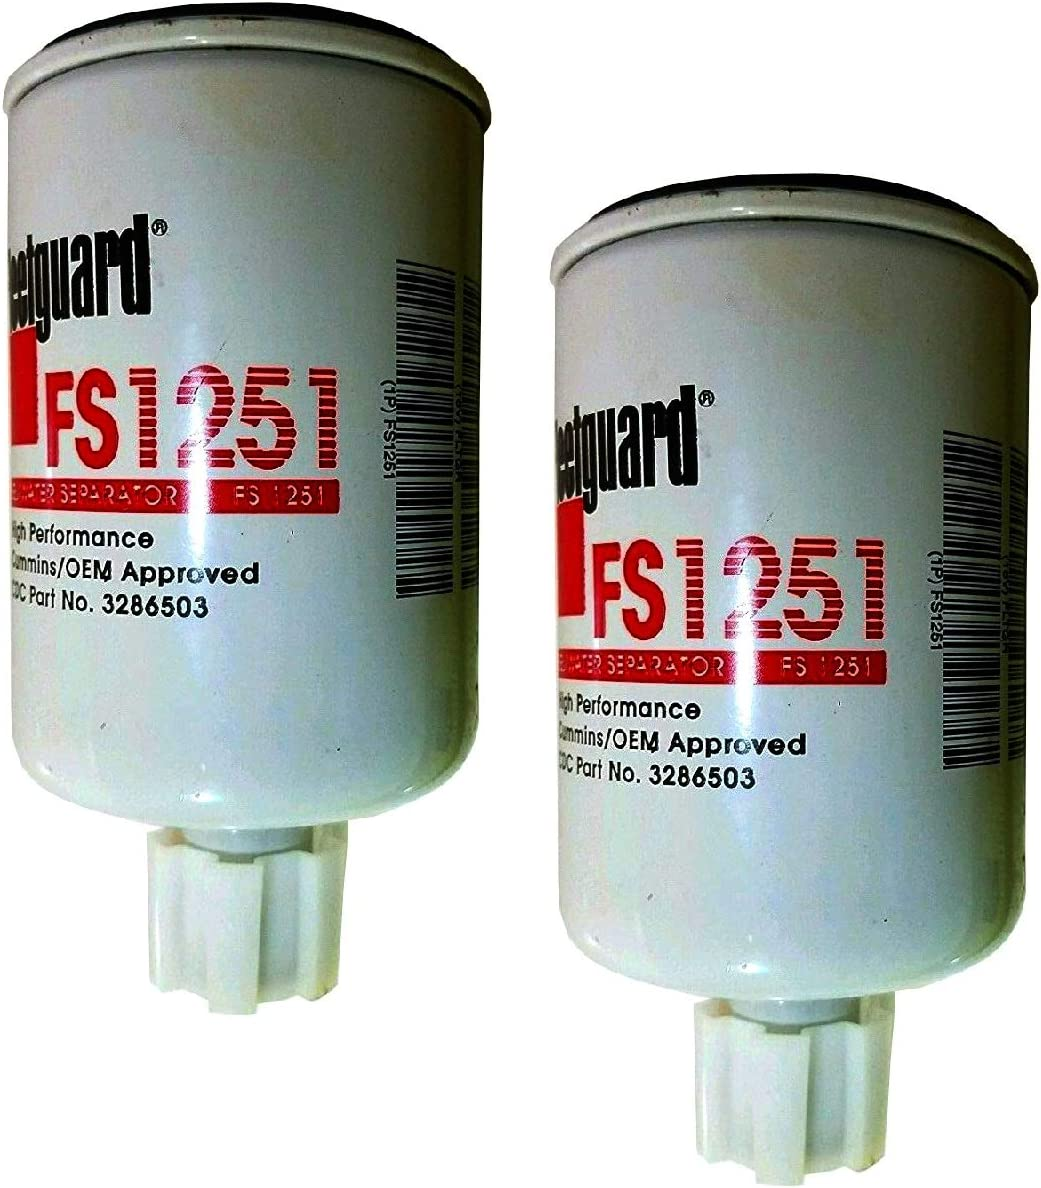 FS1251 Fleetguard Fuel Water Sep Pack of 2